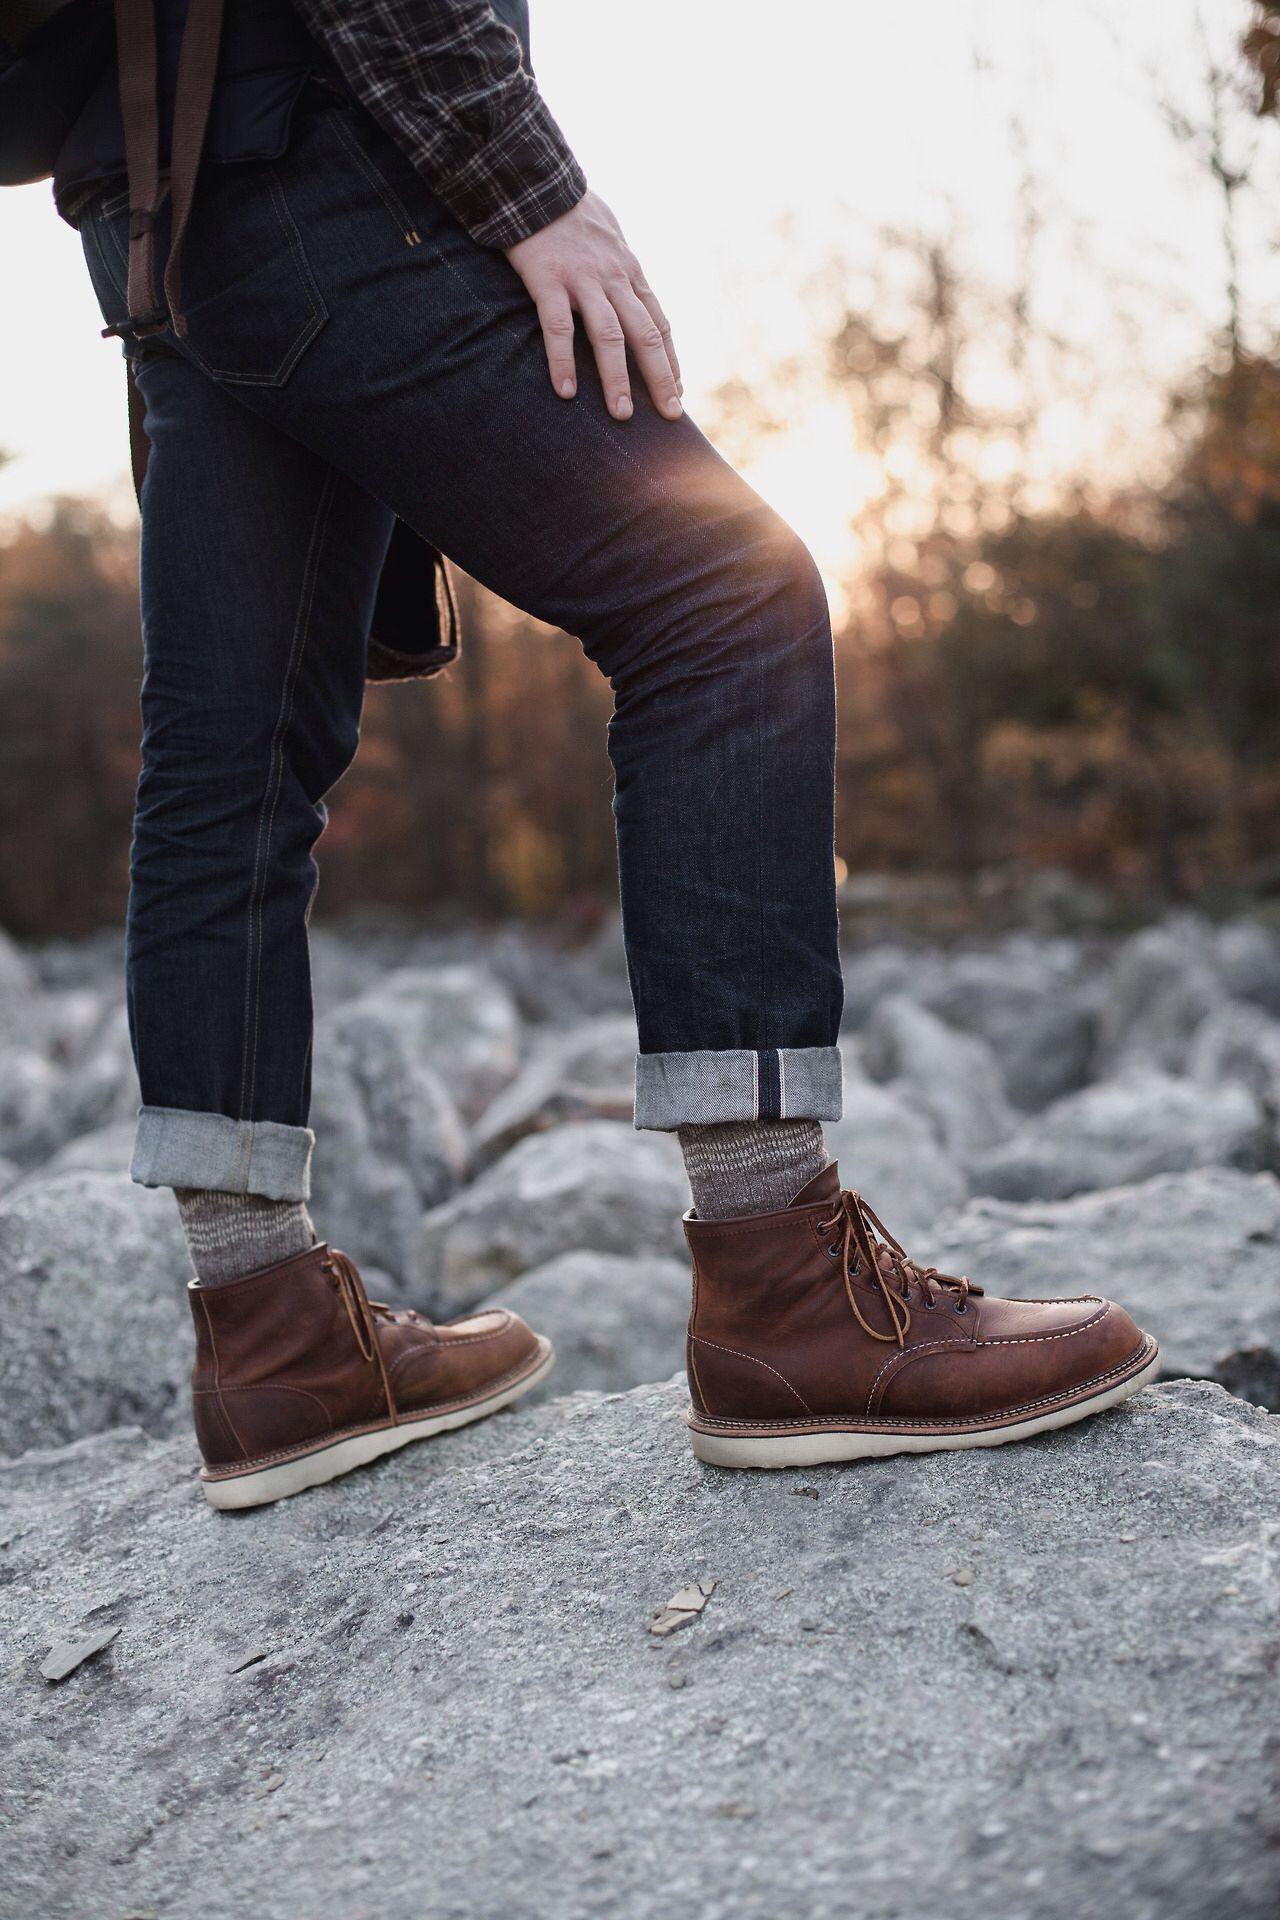 red wing boots | Moc toe boots men, Moc